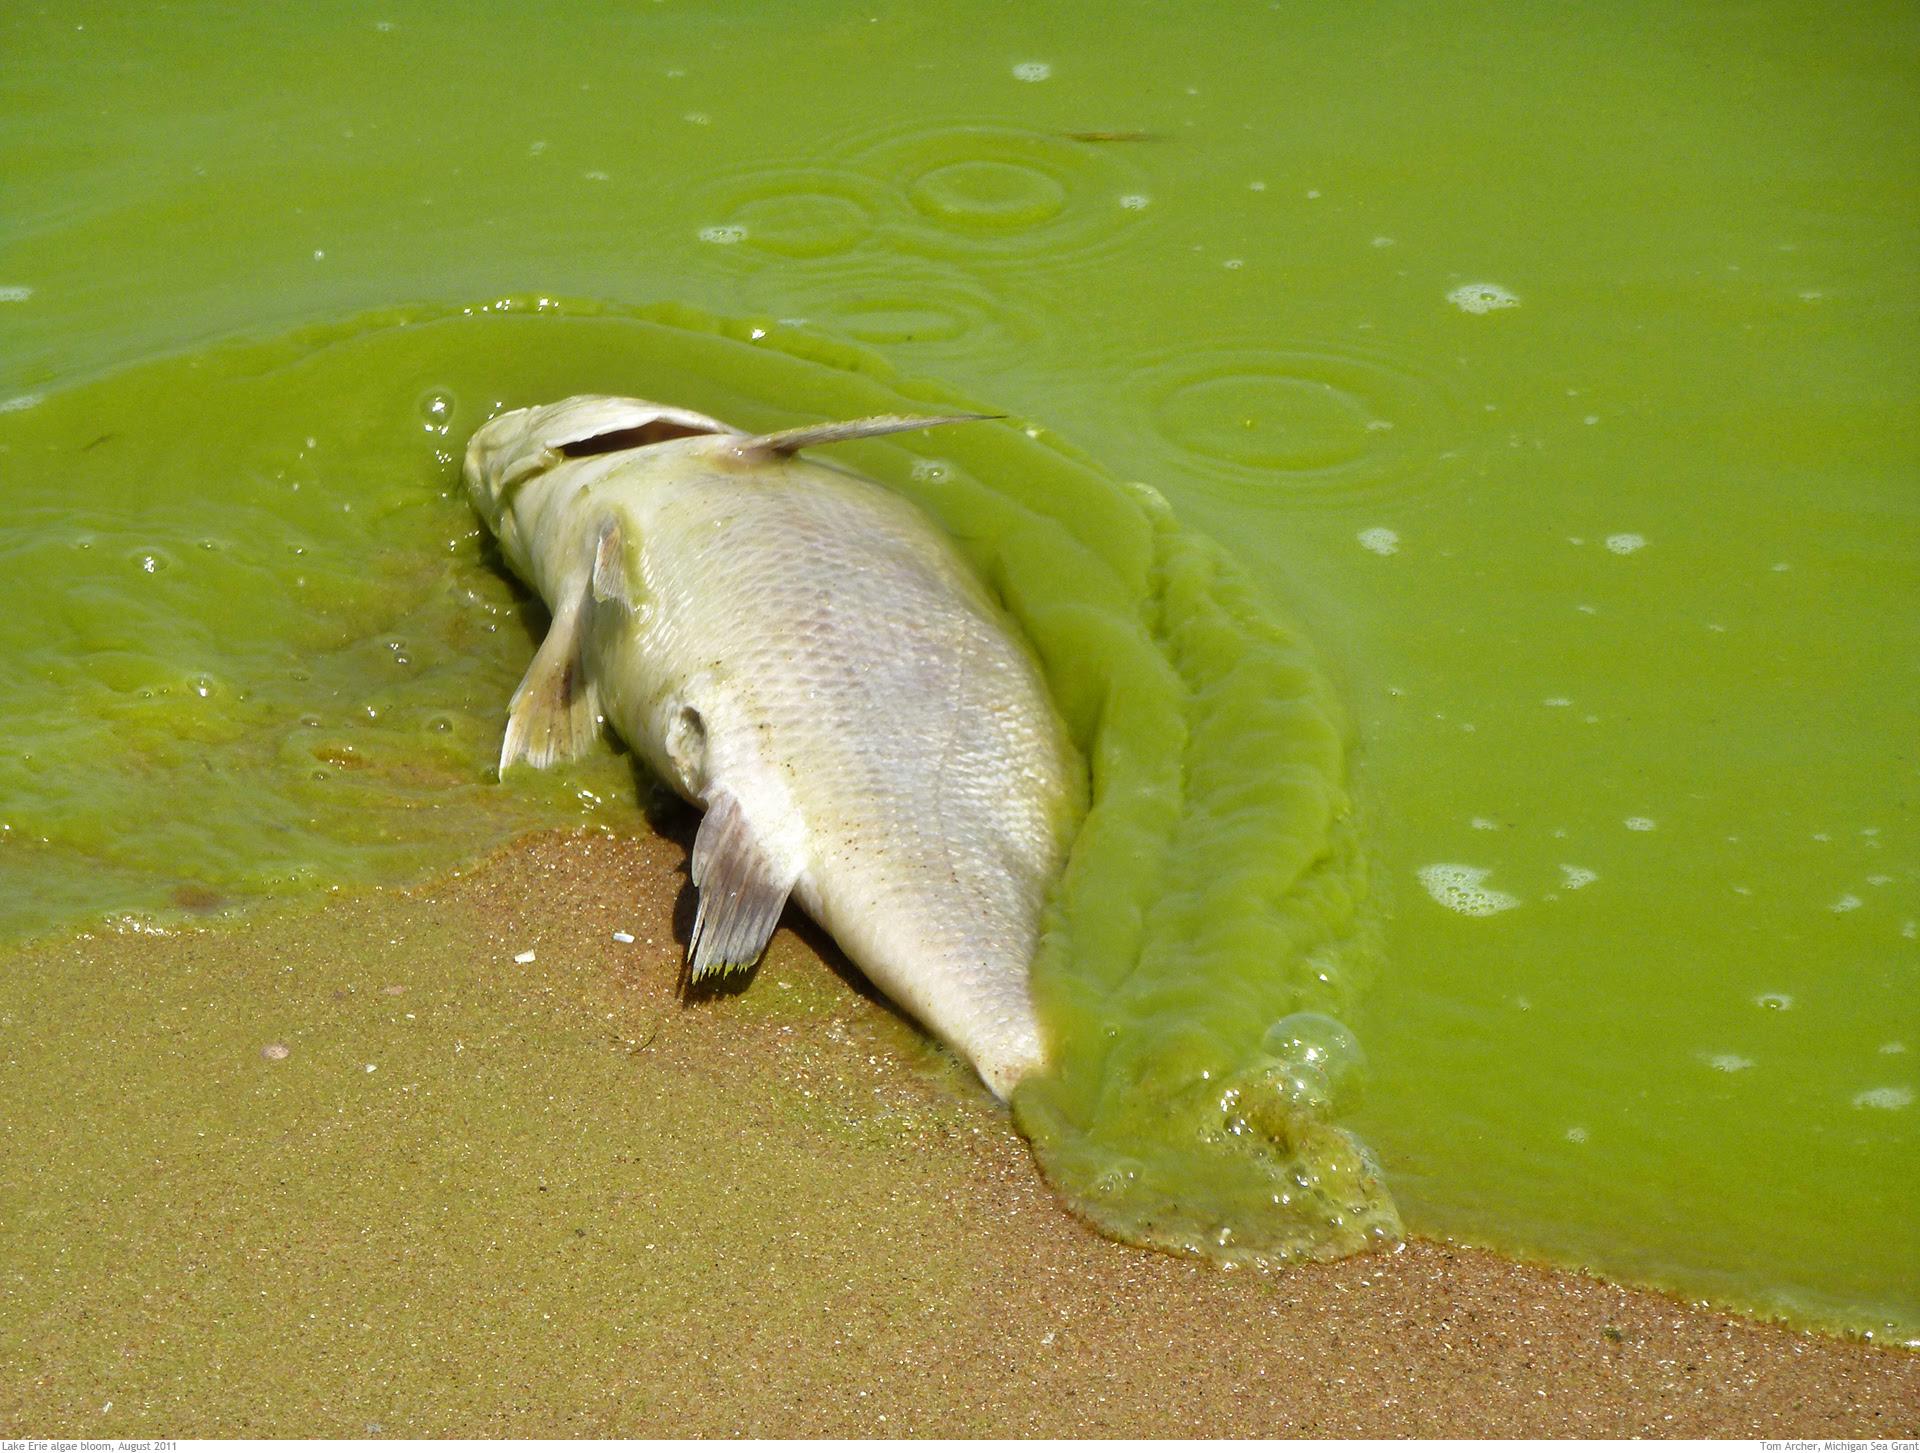 lake erie algae bloomFish_large